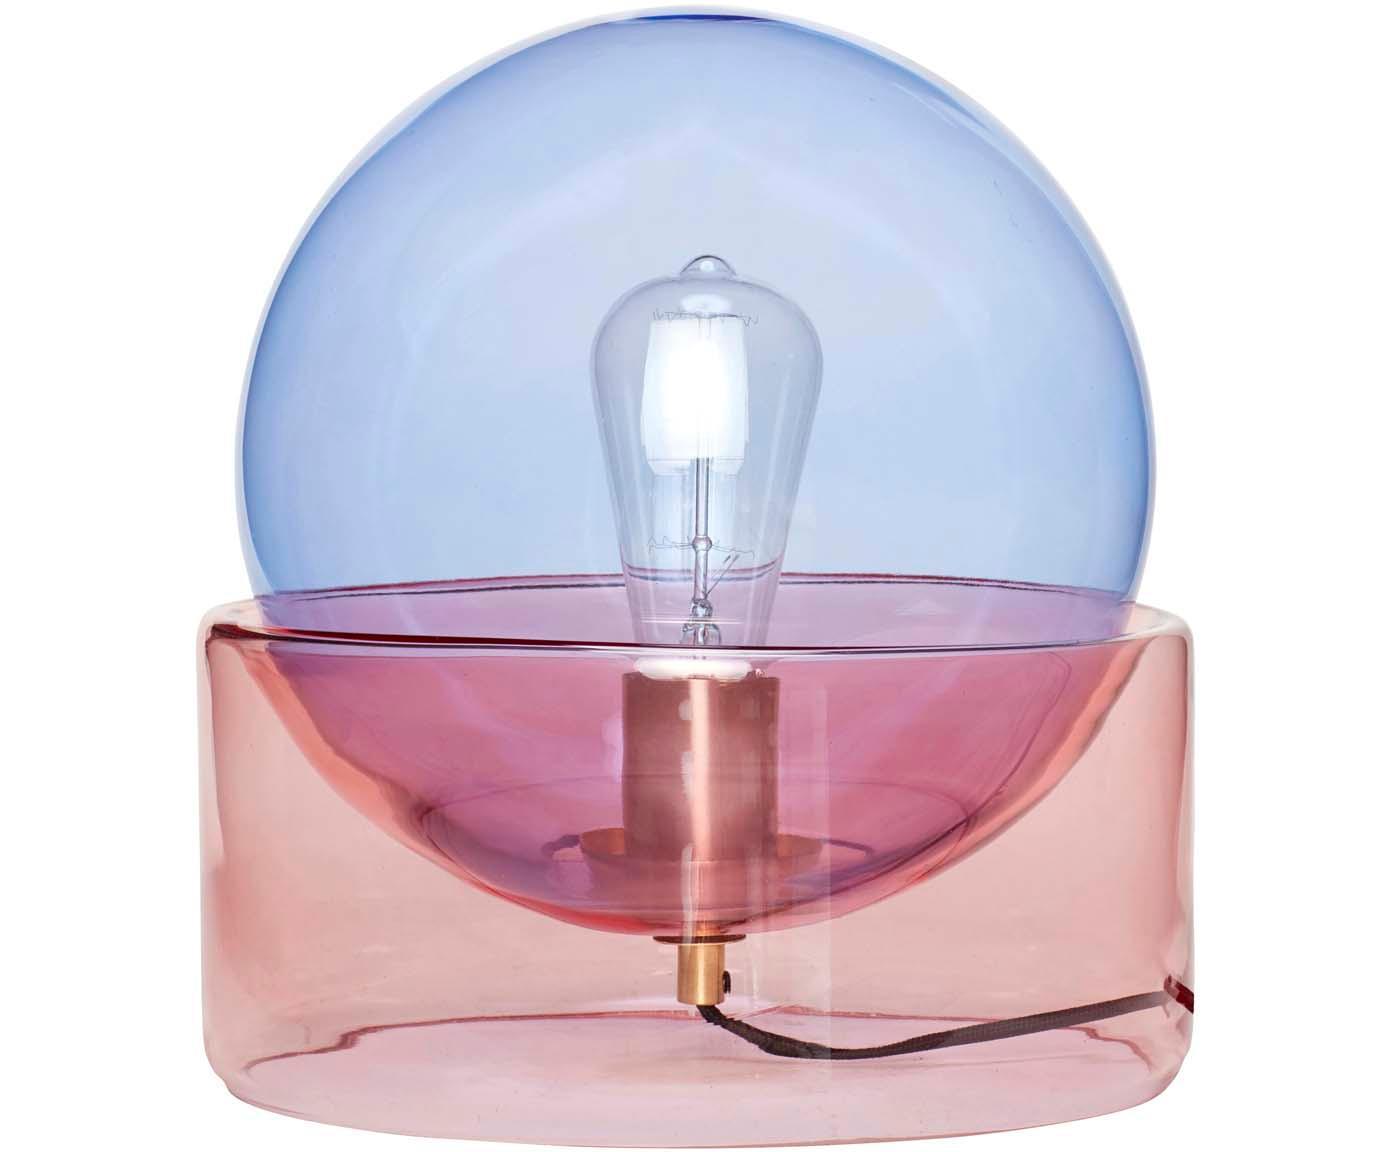 Lampada da tavolo Glondy, Lampada: vetro, Blu, rosa, Ø 27 x Alt. 29 cm